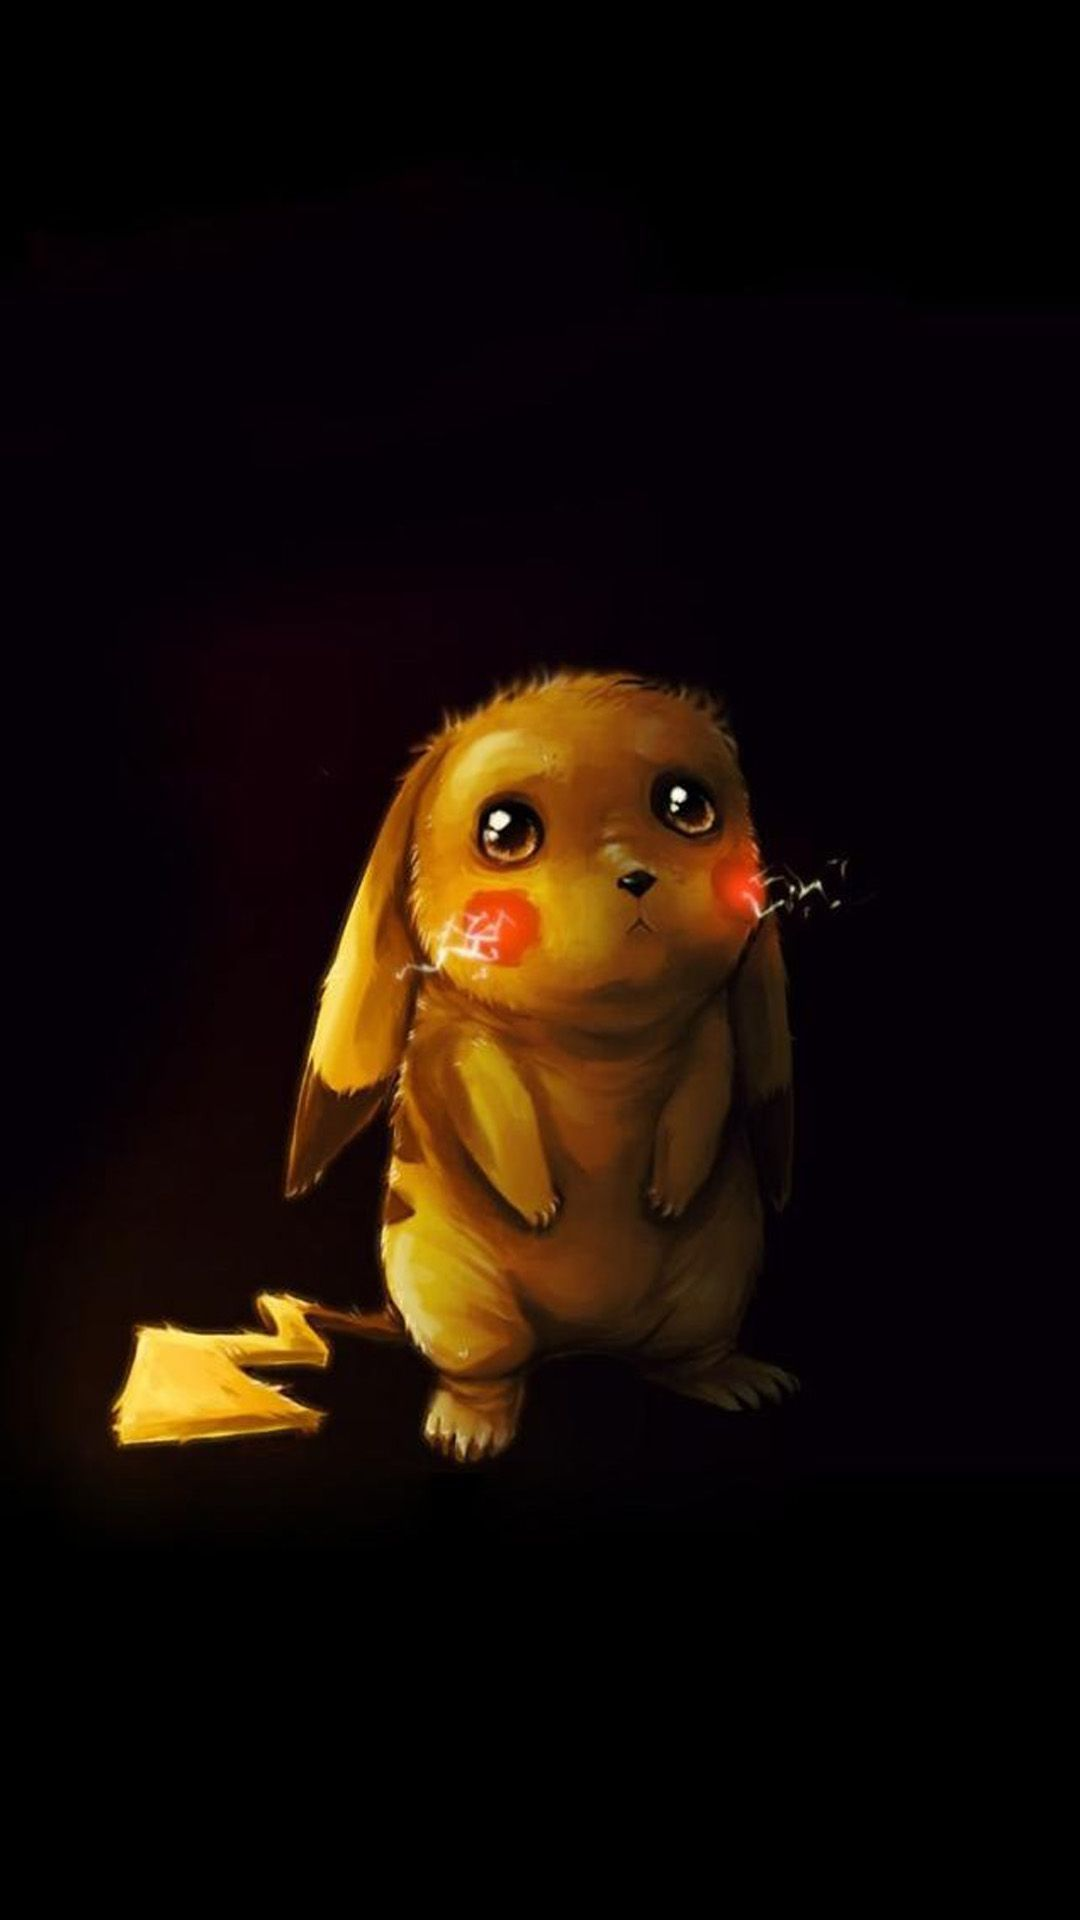 Pin On Pikachu